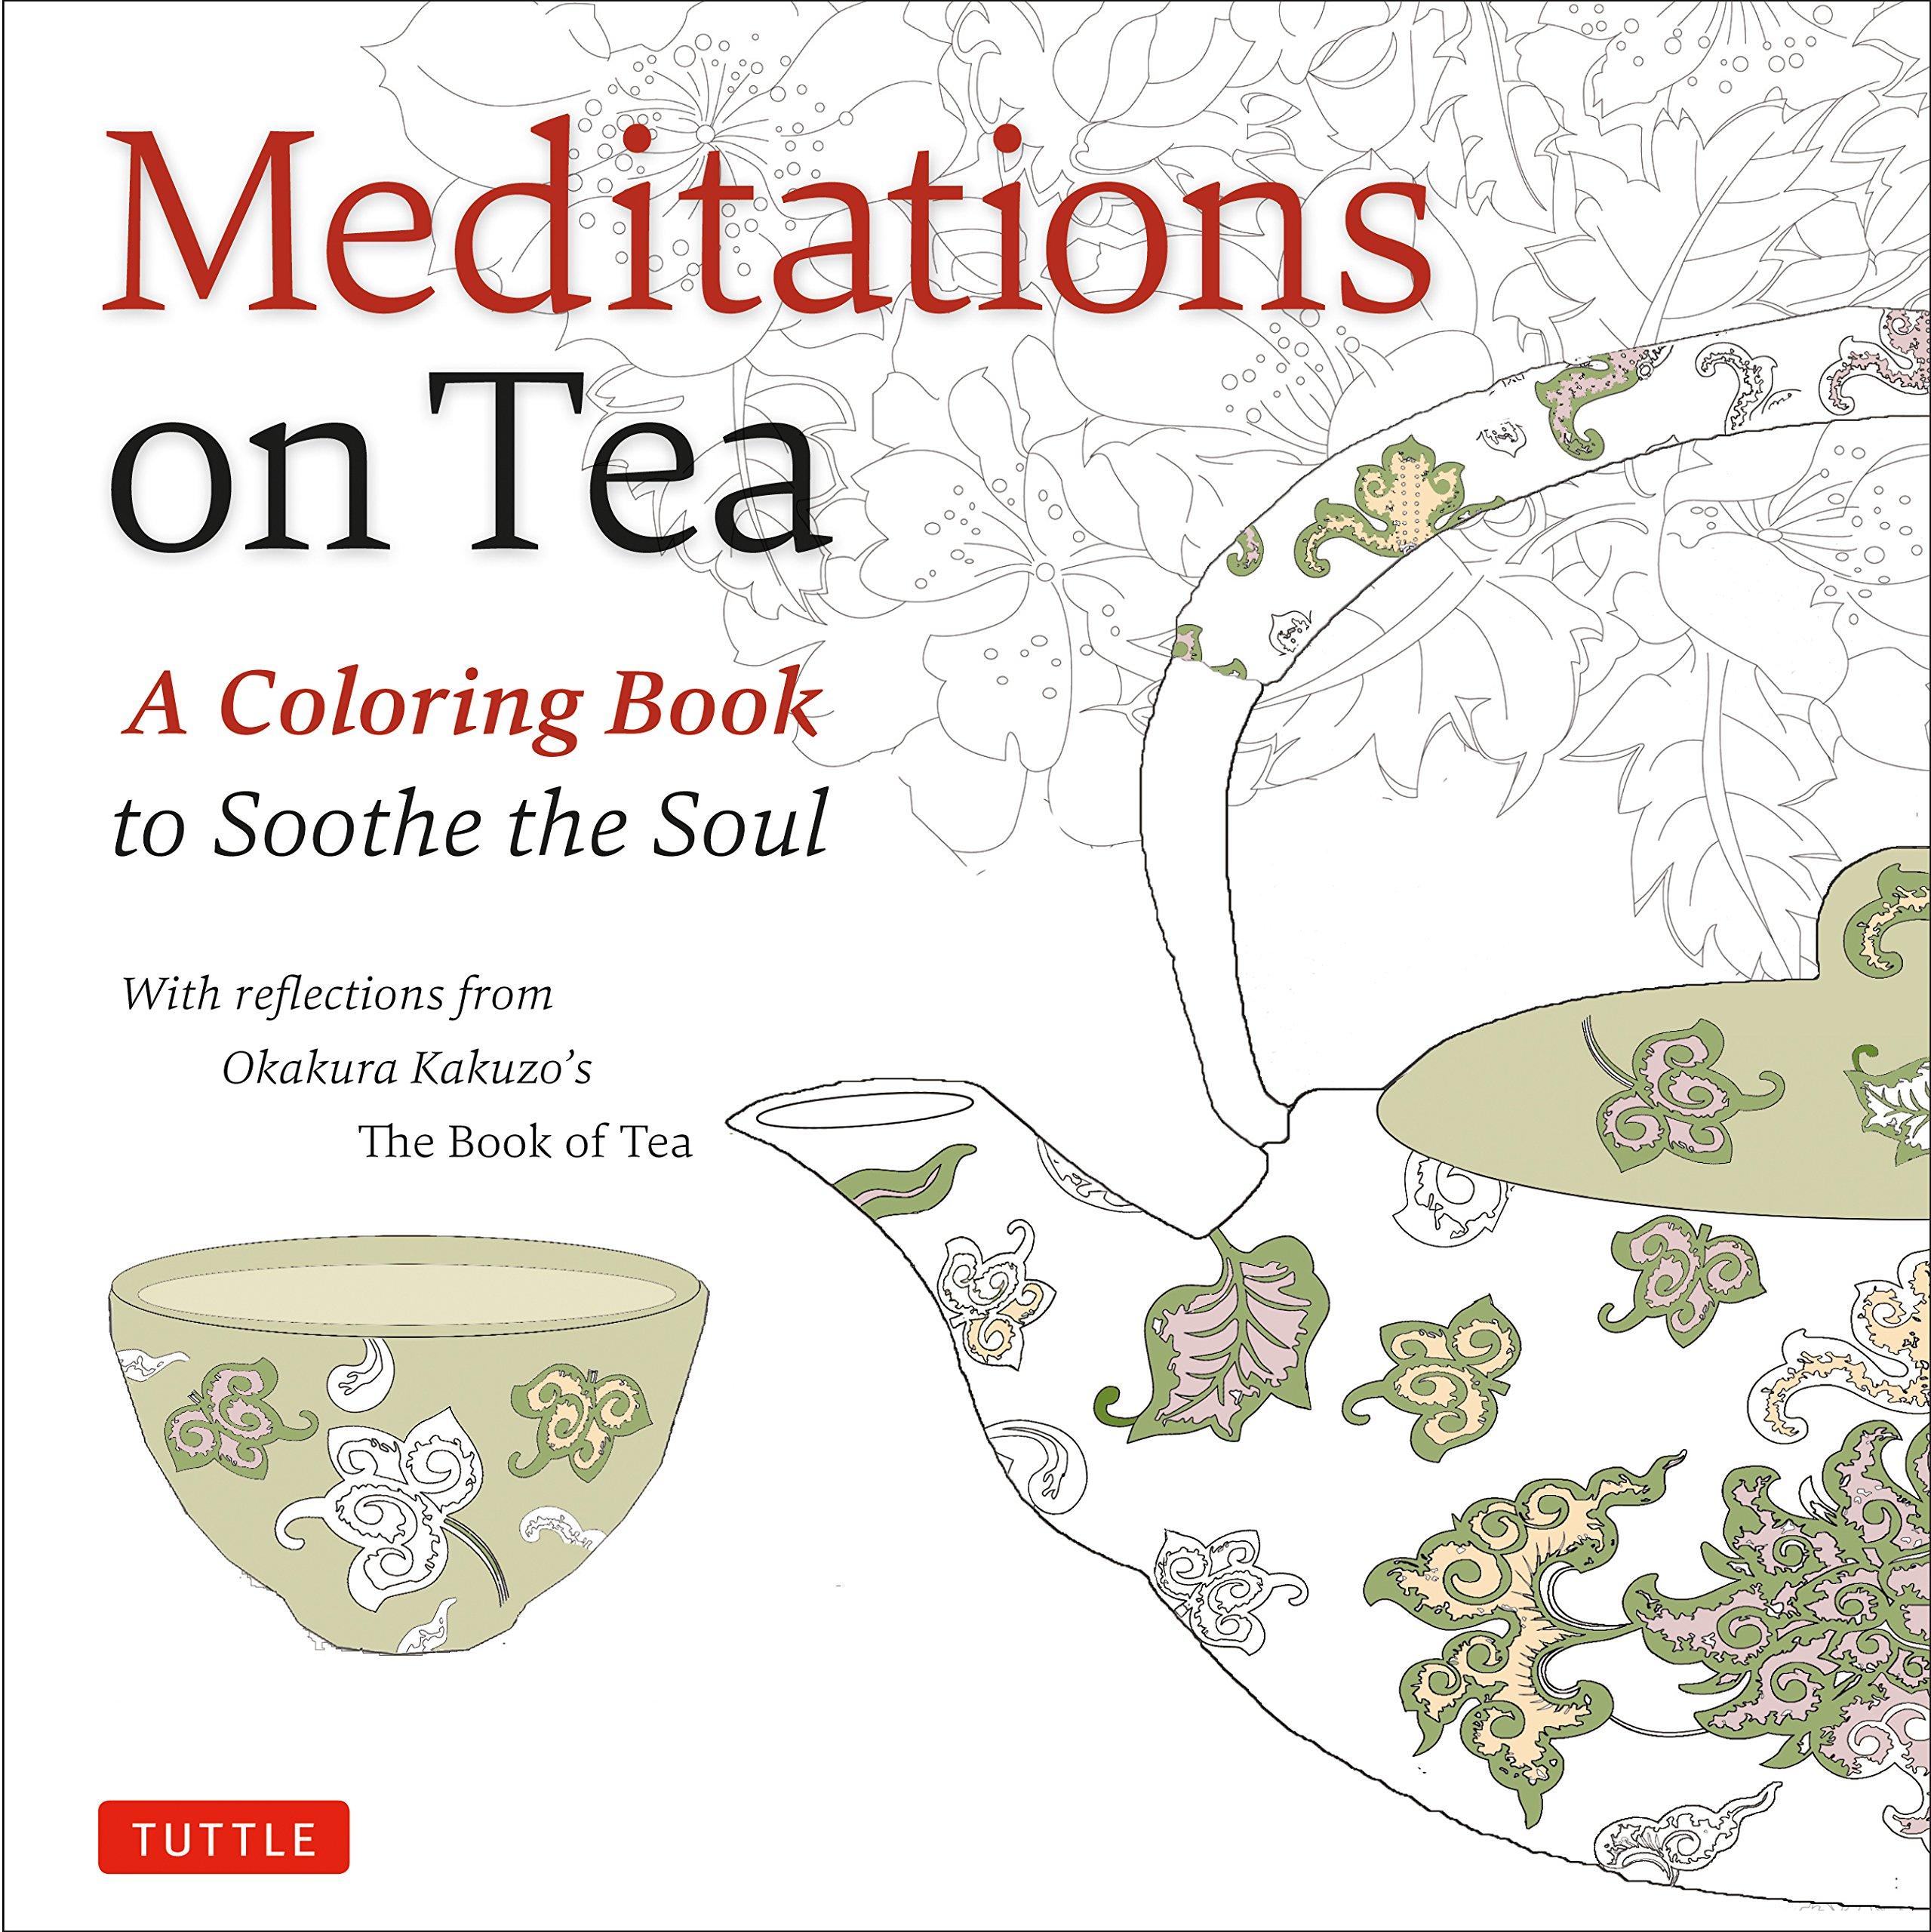 Meditations On Tea A Coloring Book To Soothe The Soul With Reflections From Okakura Kakuzos Of Kakuzo 9780804847193 Amazon